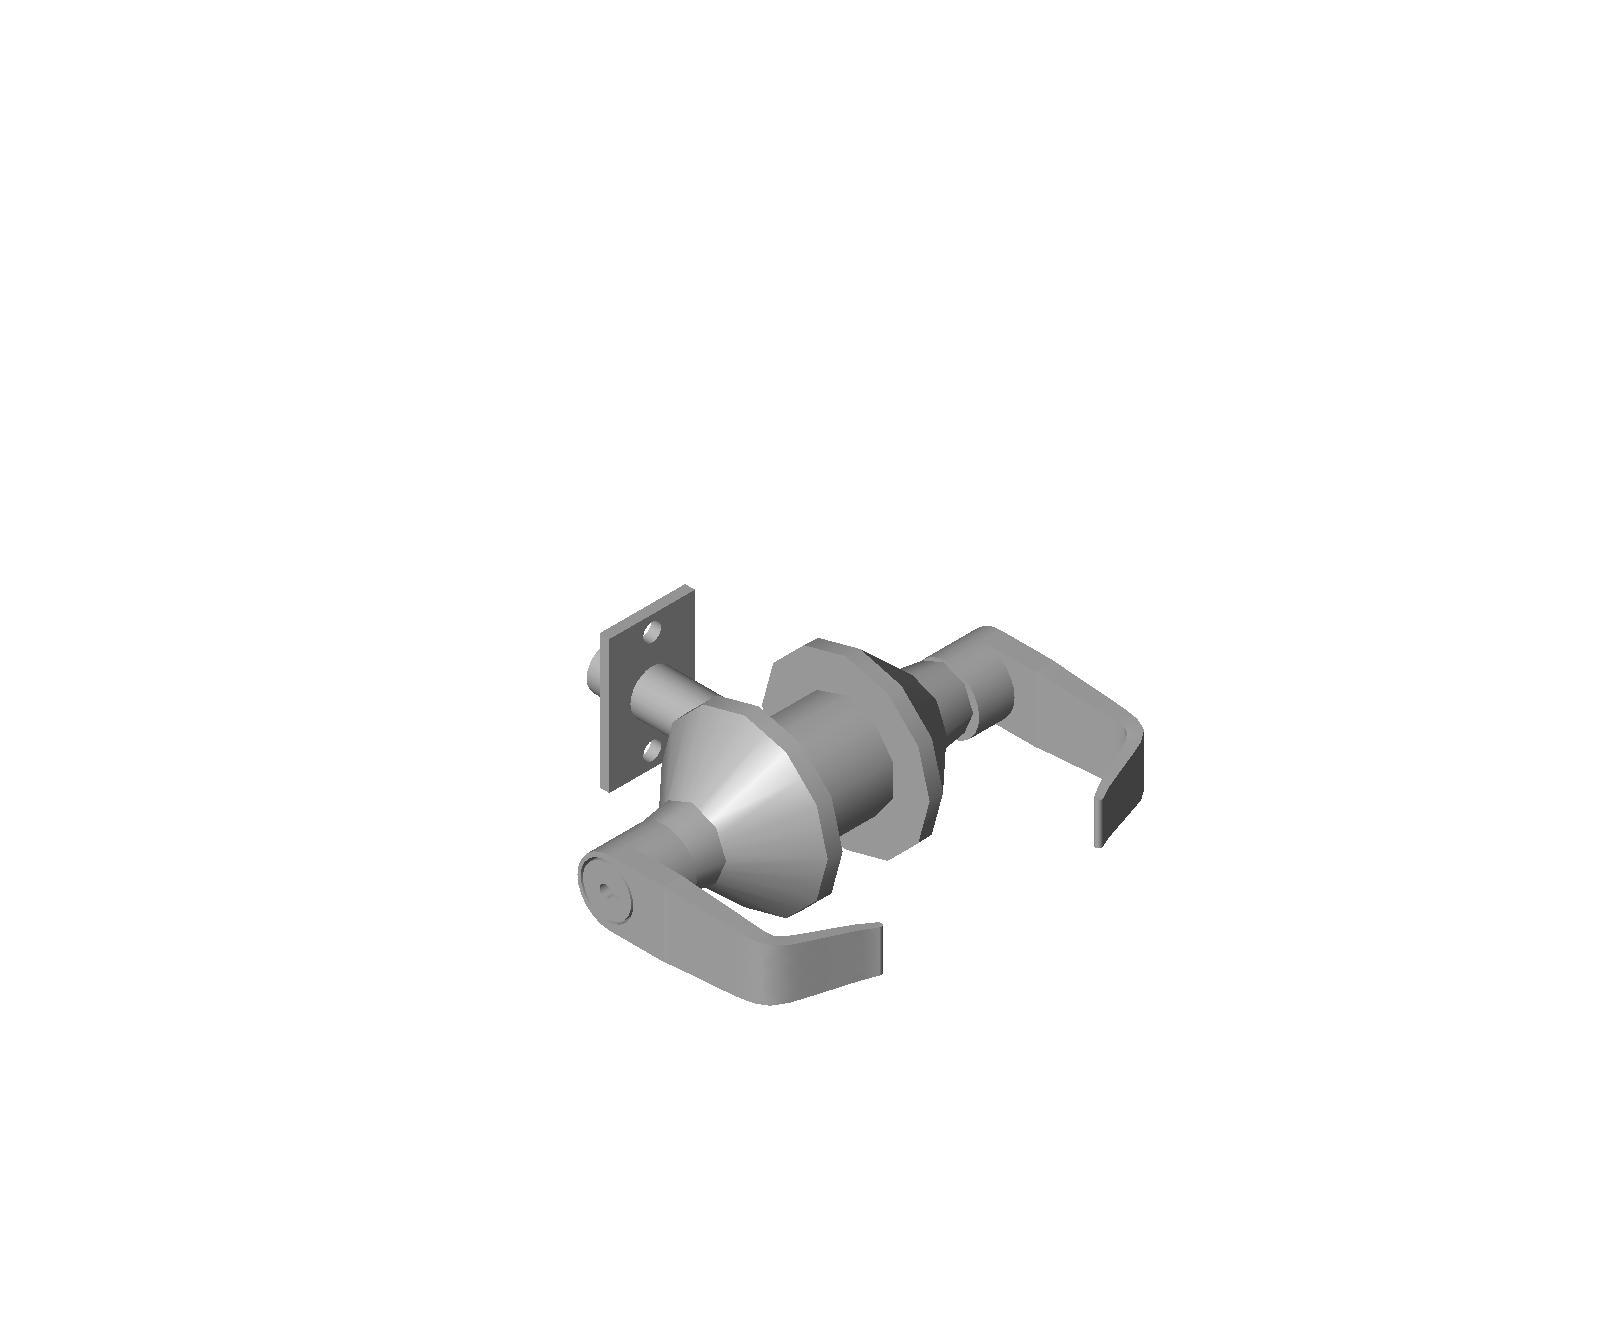 Doors and Hardware Door Hardware Locksets - Cylindrical Grade2 - PDQ - GP Series - PHL (PDQ Mfg.)  sc 1 st  Arcat & BIM Objects / Families pezcame.com